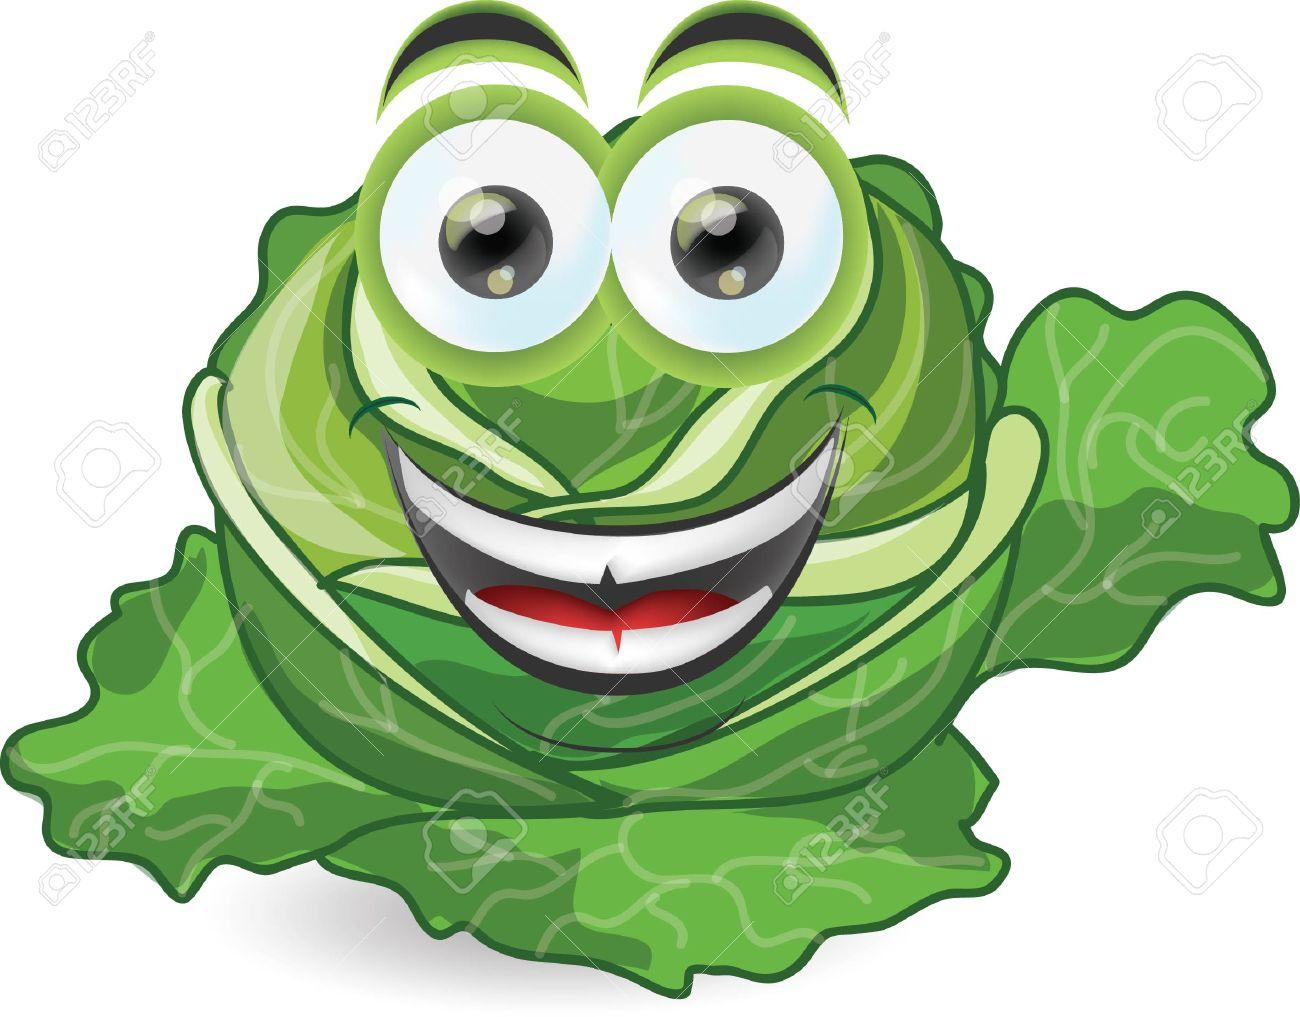 Cartoon funny cabbage - 23854704